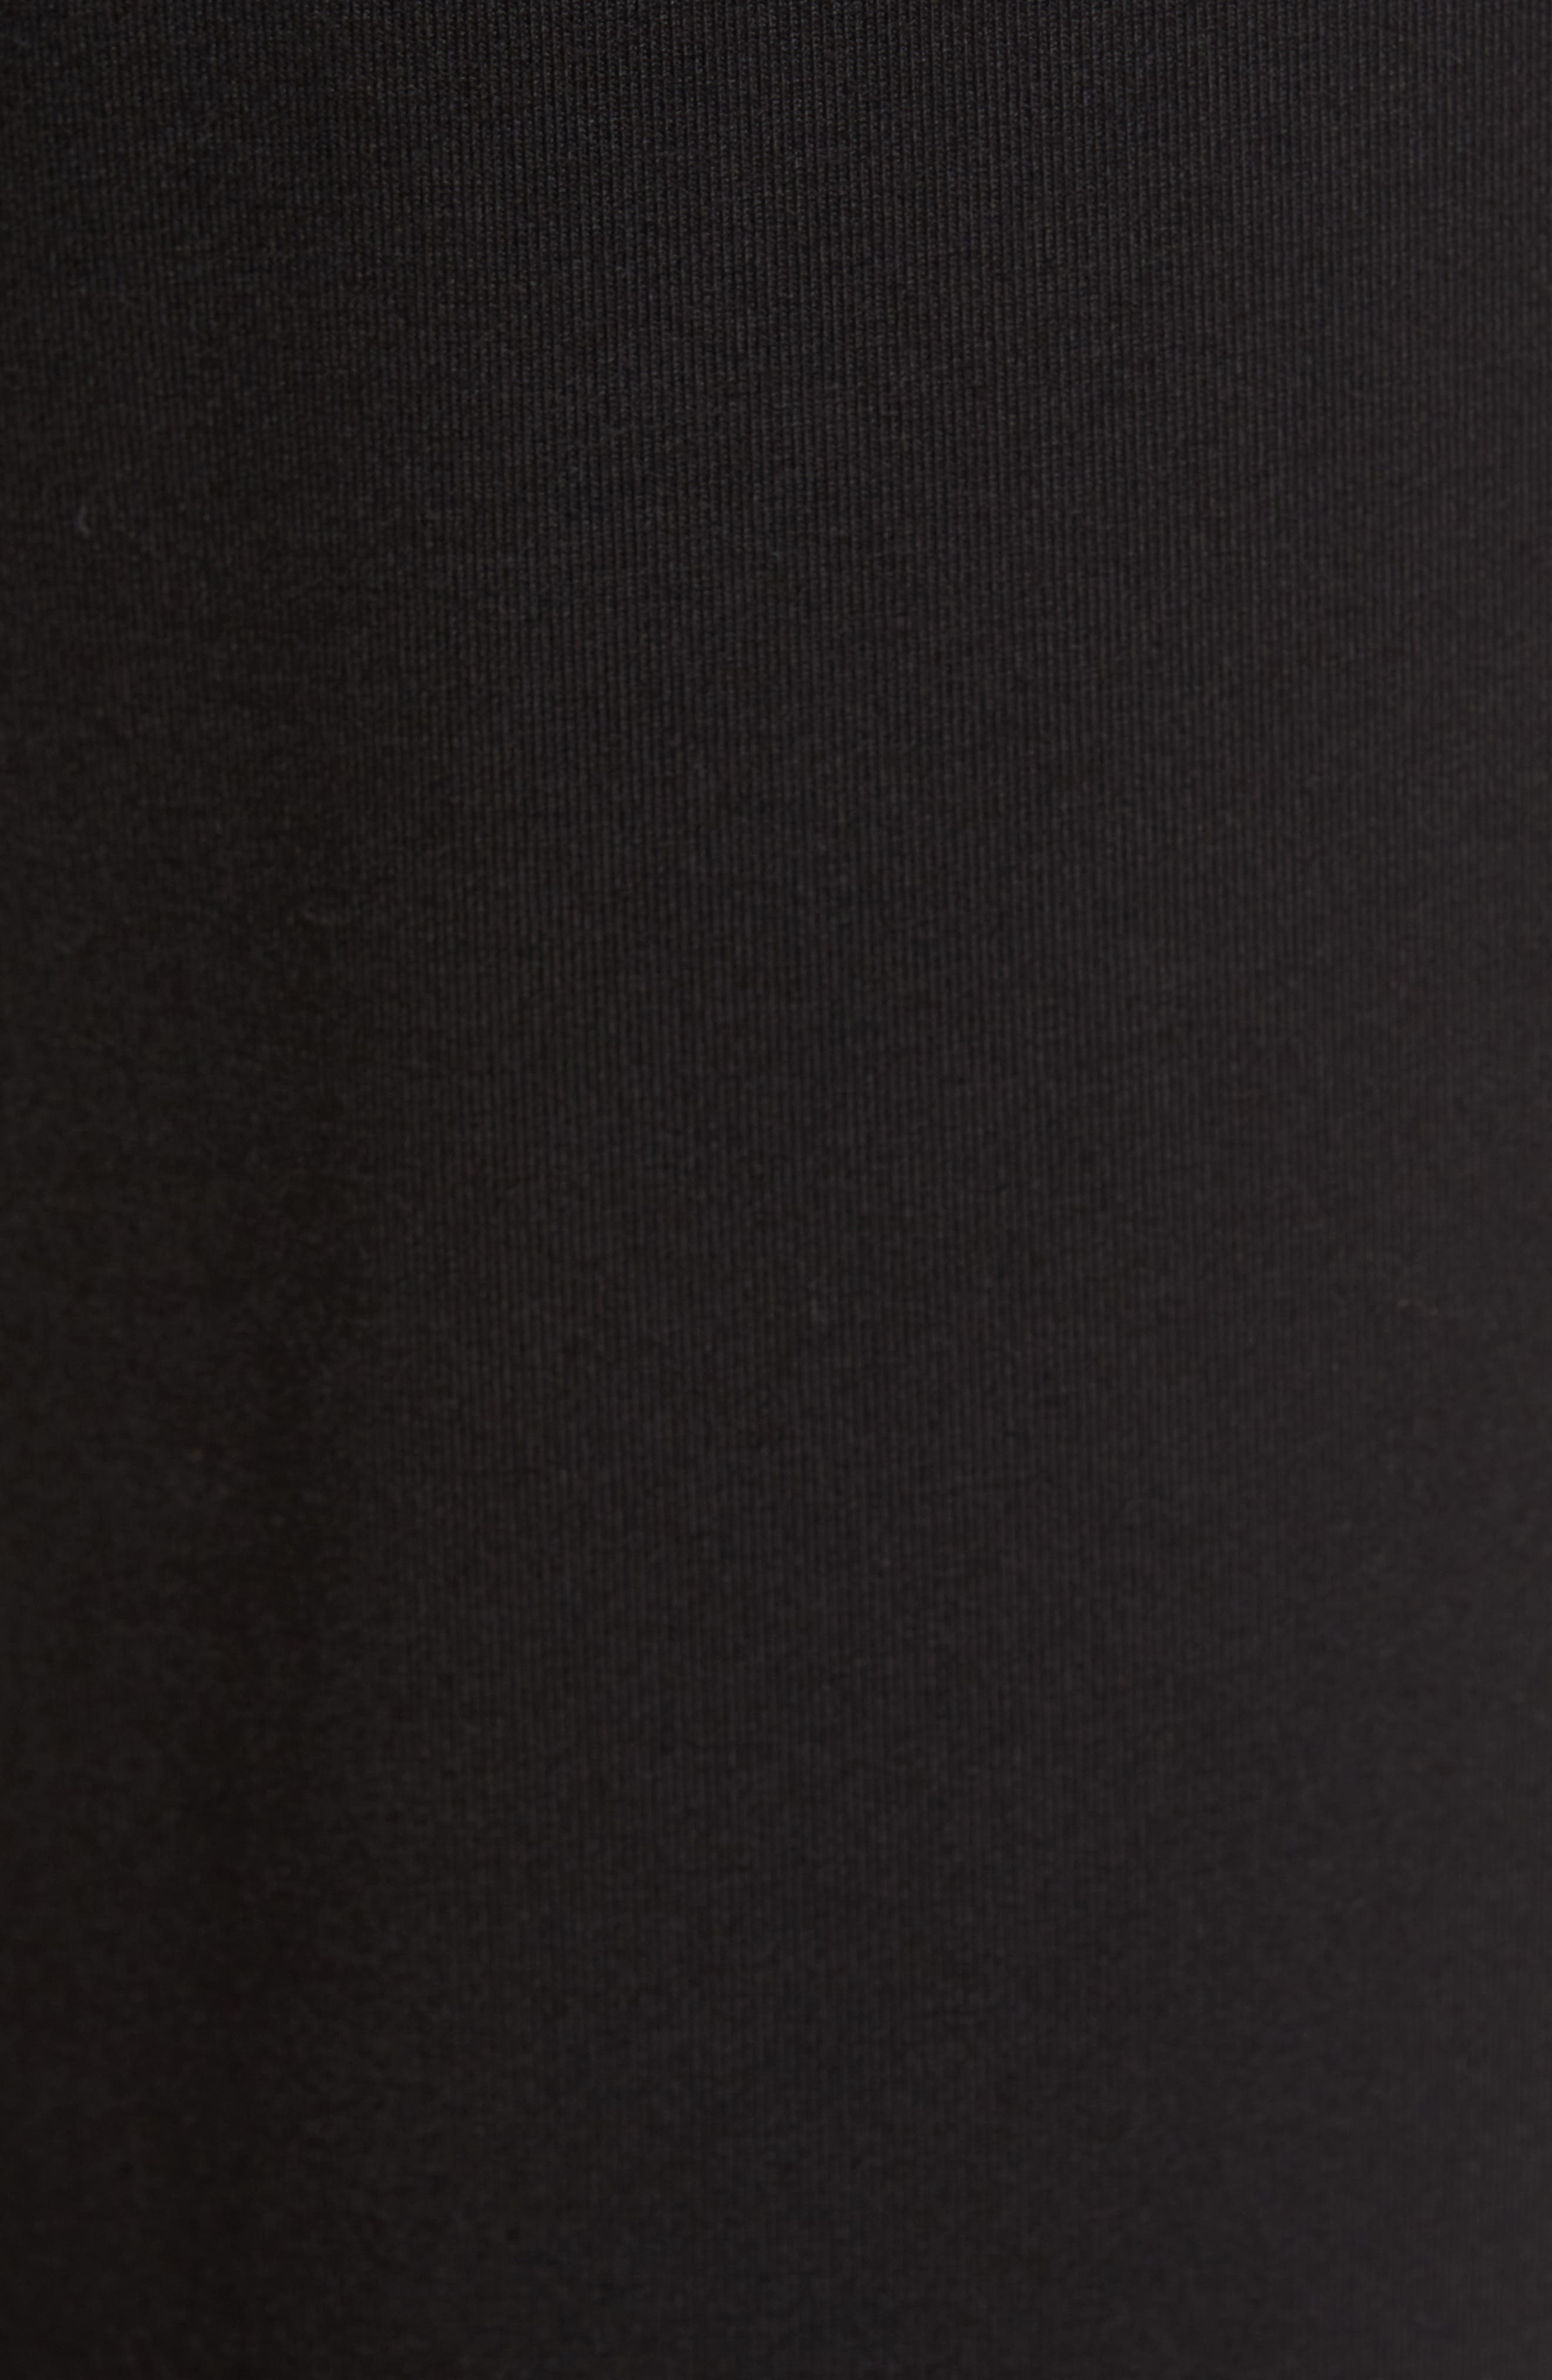 Grommet Detail Skinny Knit Pants,                             Alternate thumbnail 5, color,                             001